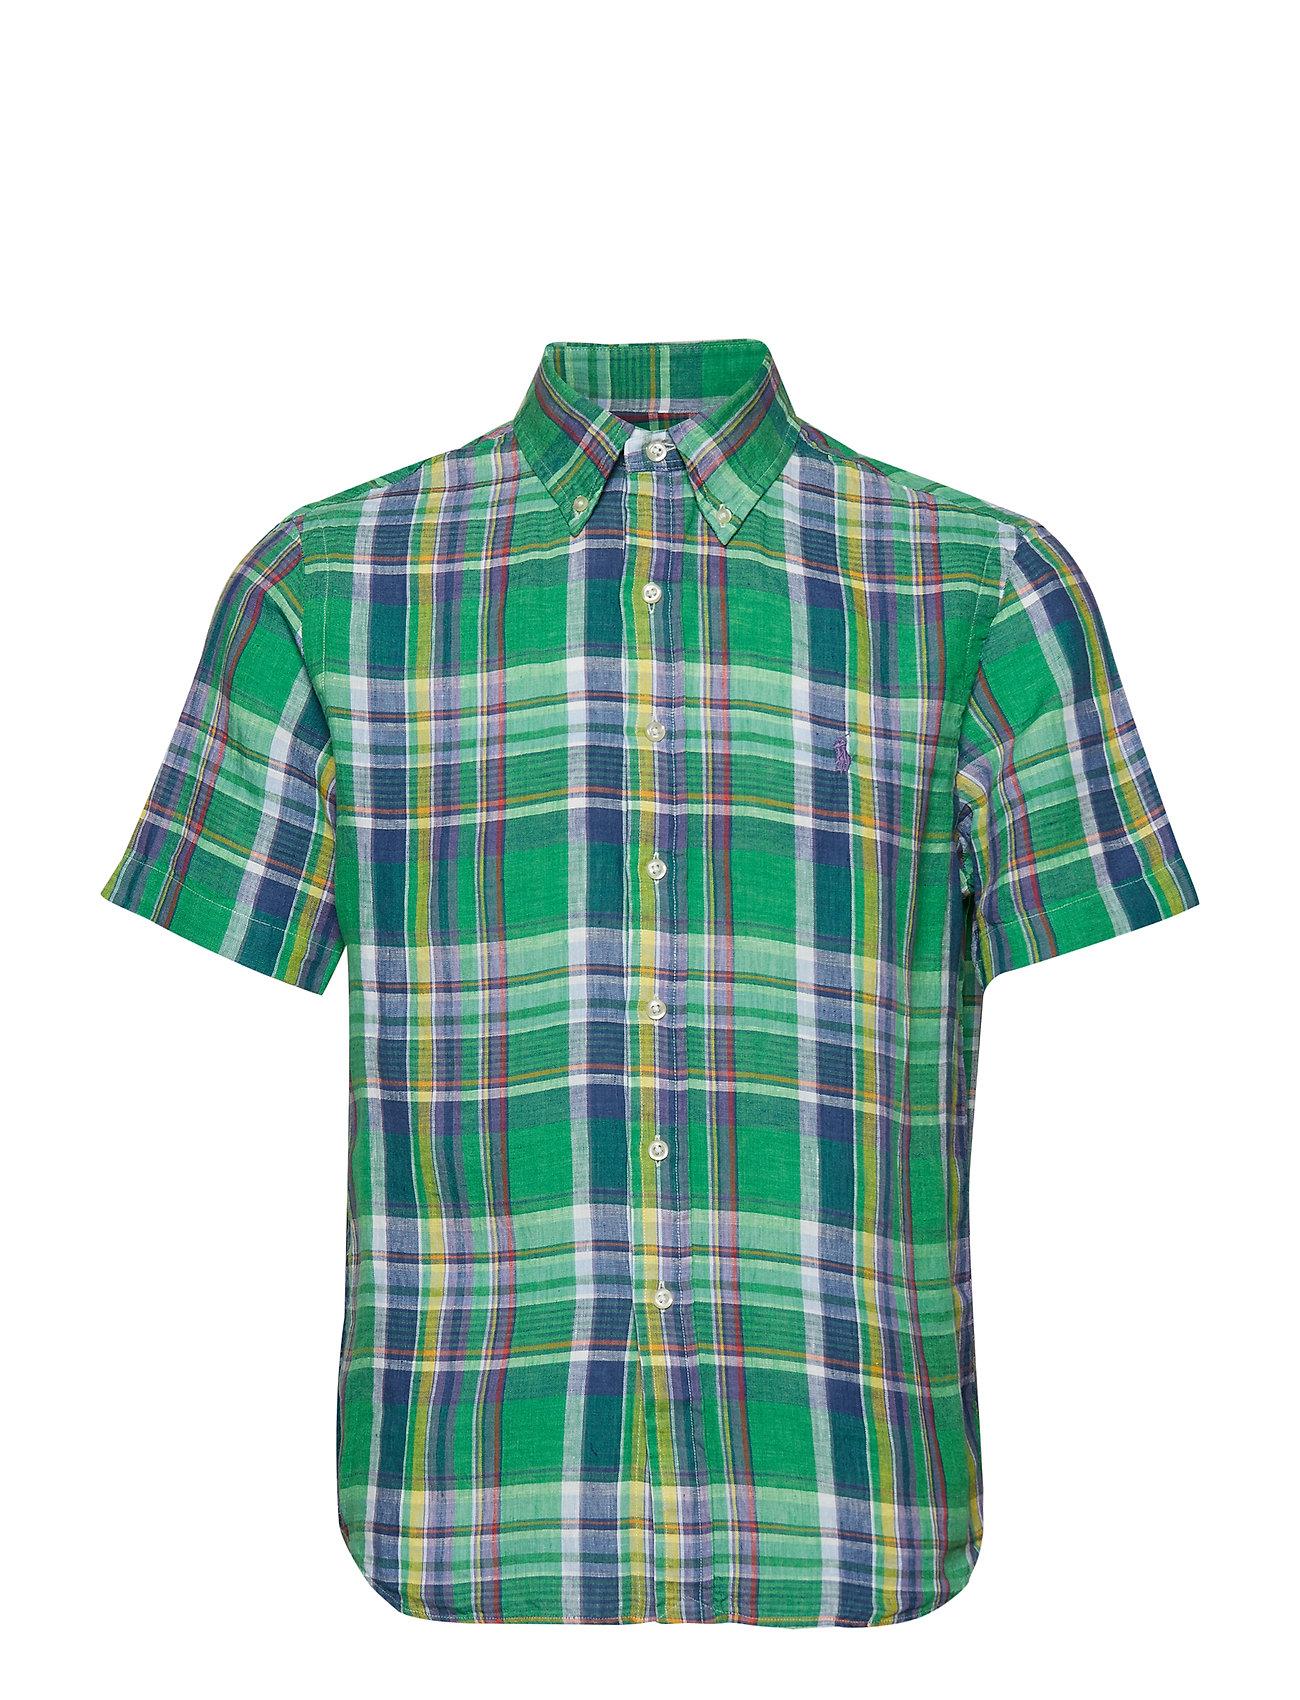 Polo Ralph Lauren Classic Fit Linen Shirt - 3312 FOREST/YELLO